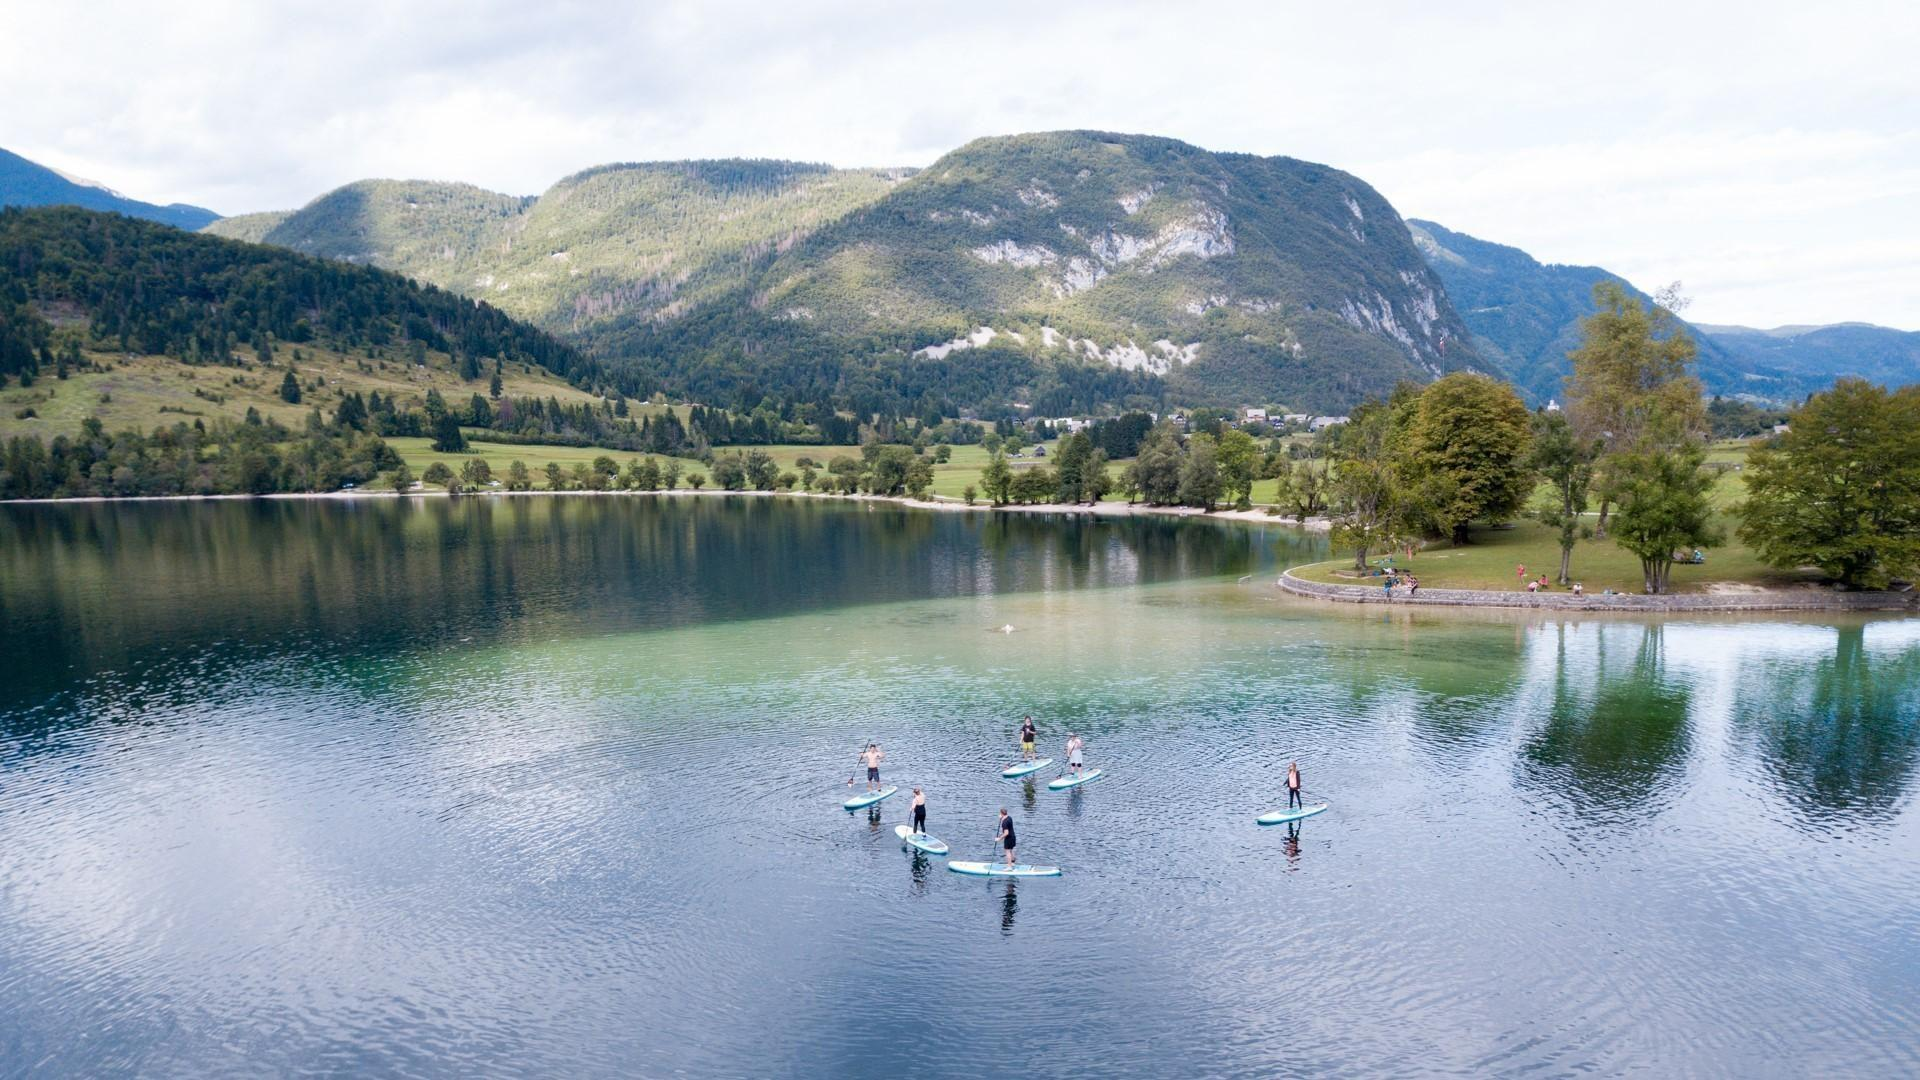 Paddleboarding bohinj lake